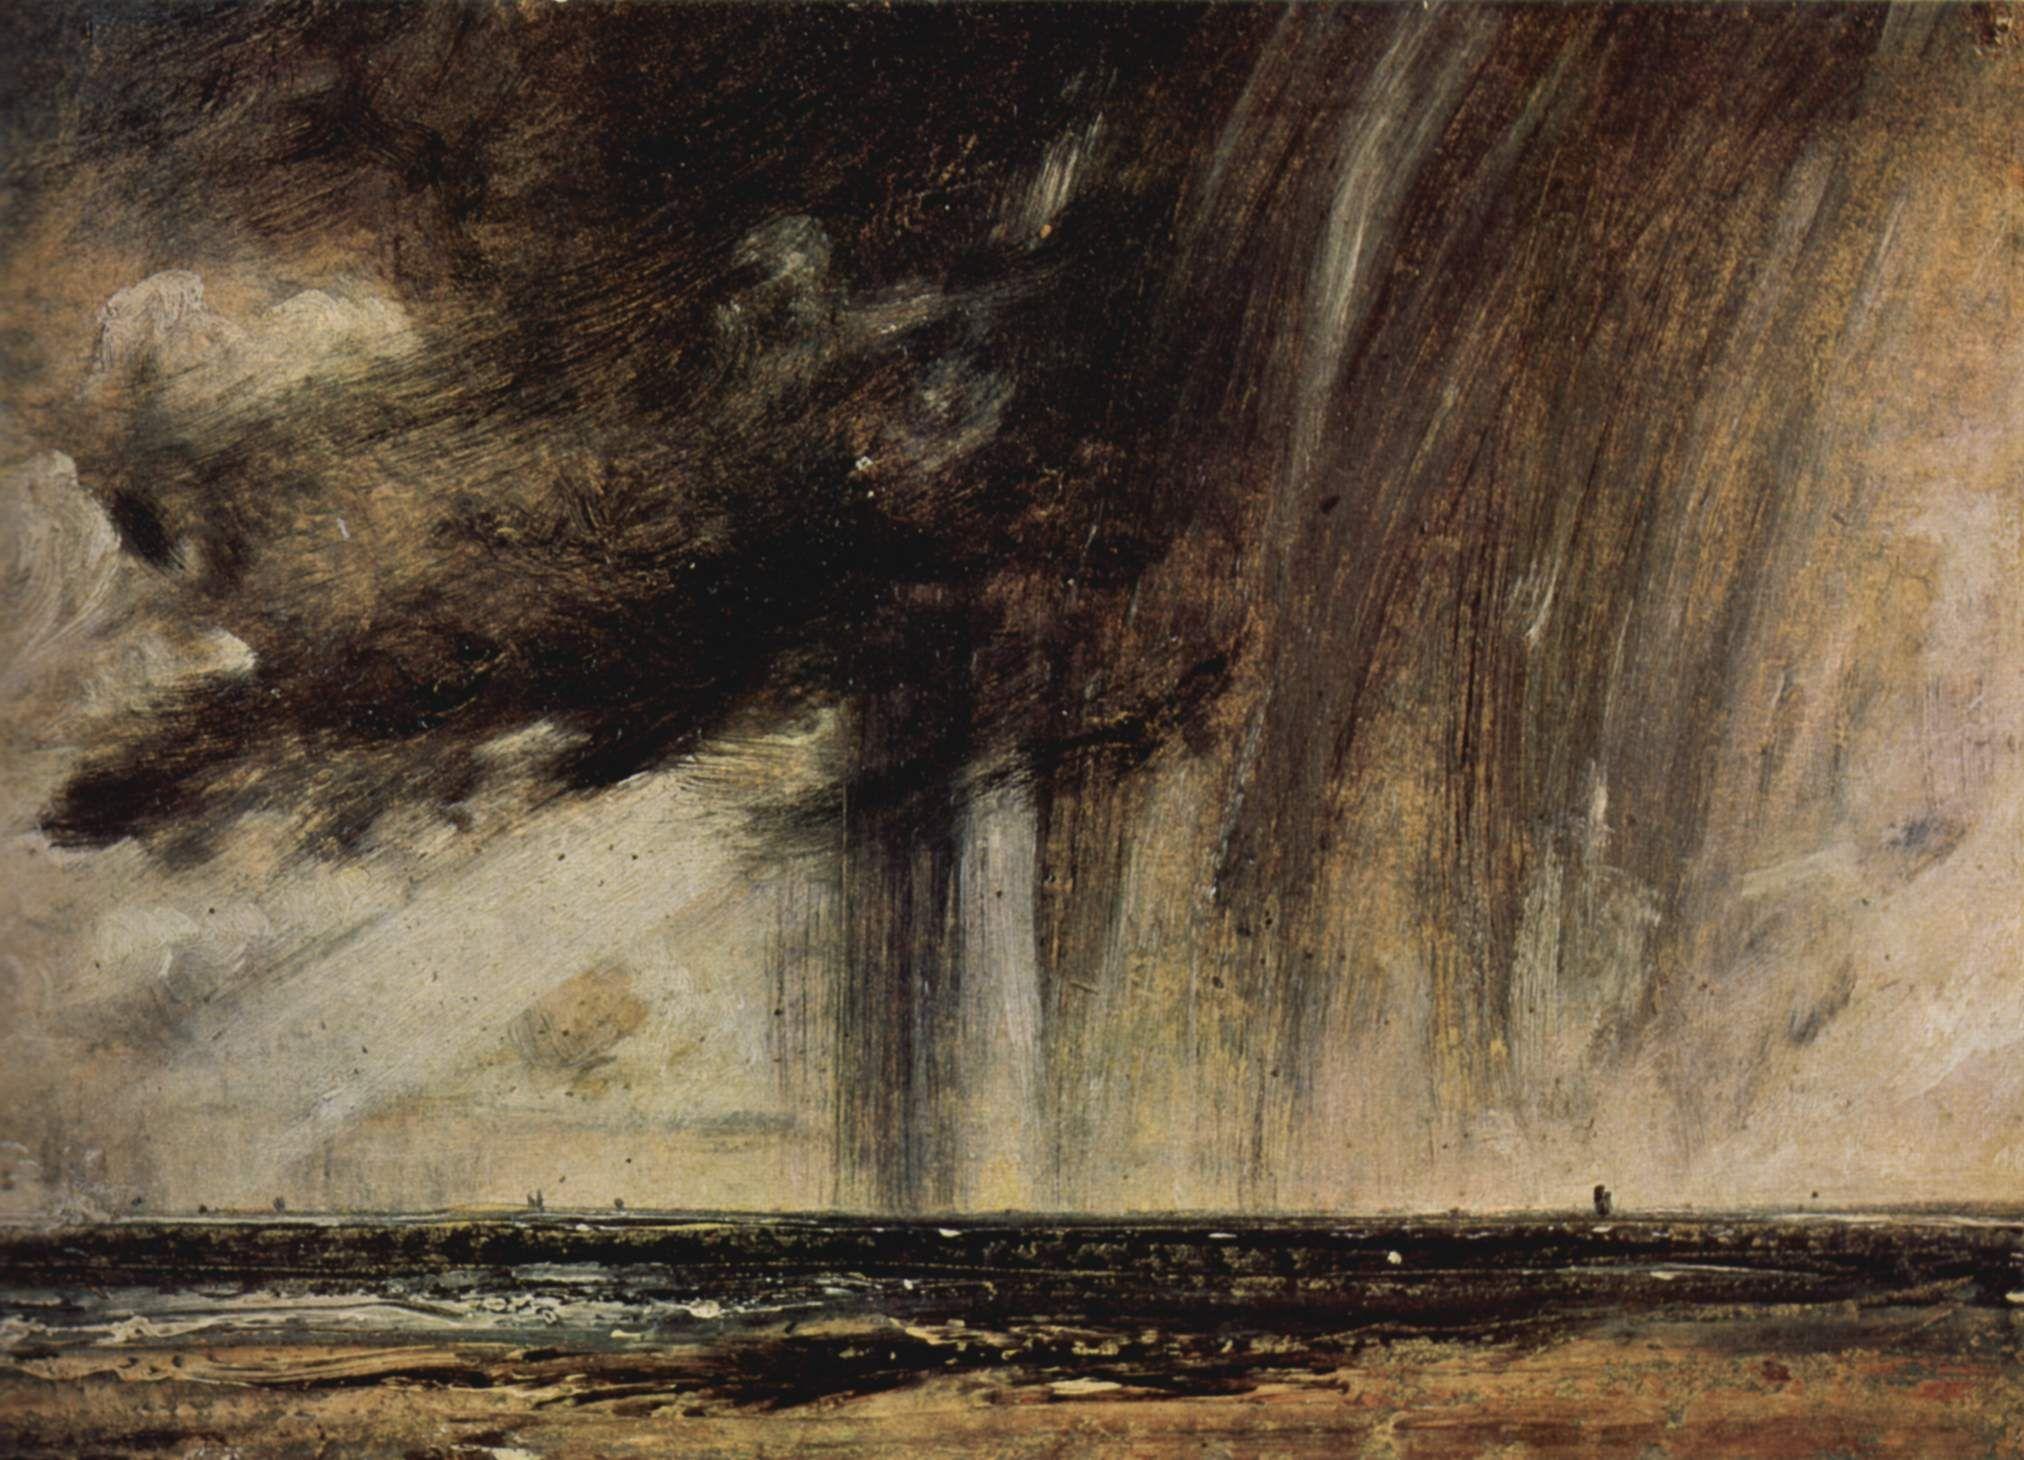 John Constable - Seascape Study with Rain Cloud (1827)